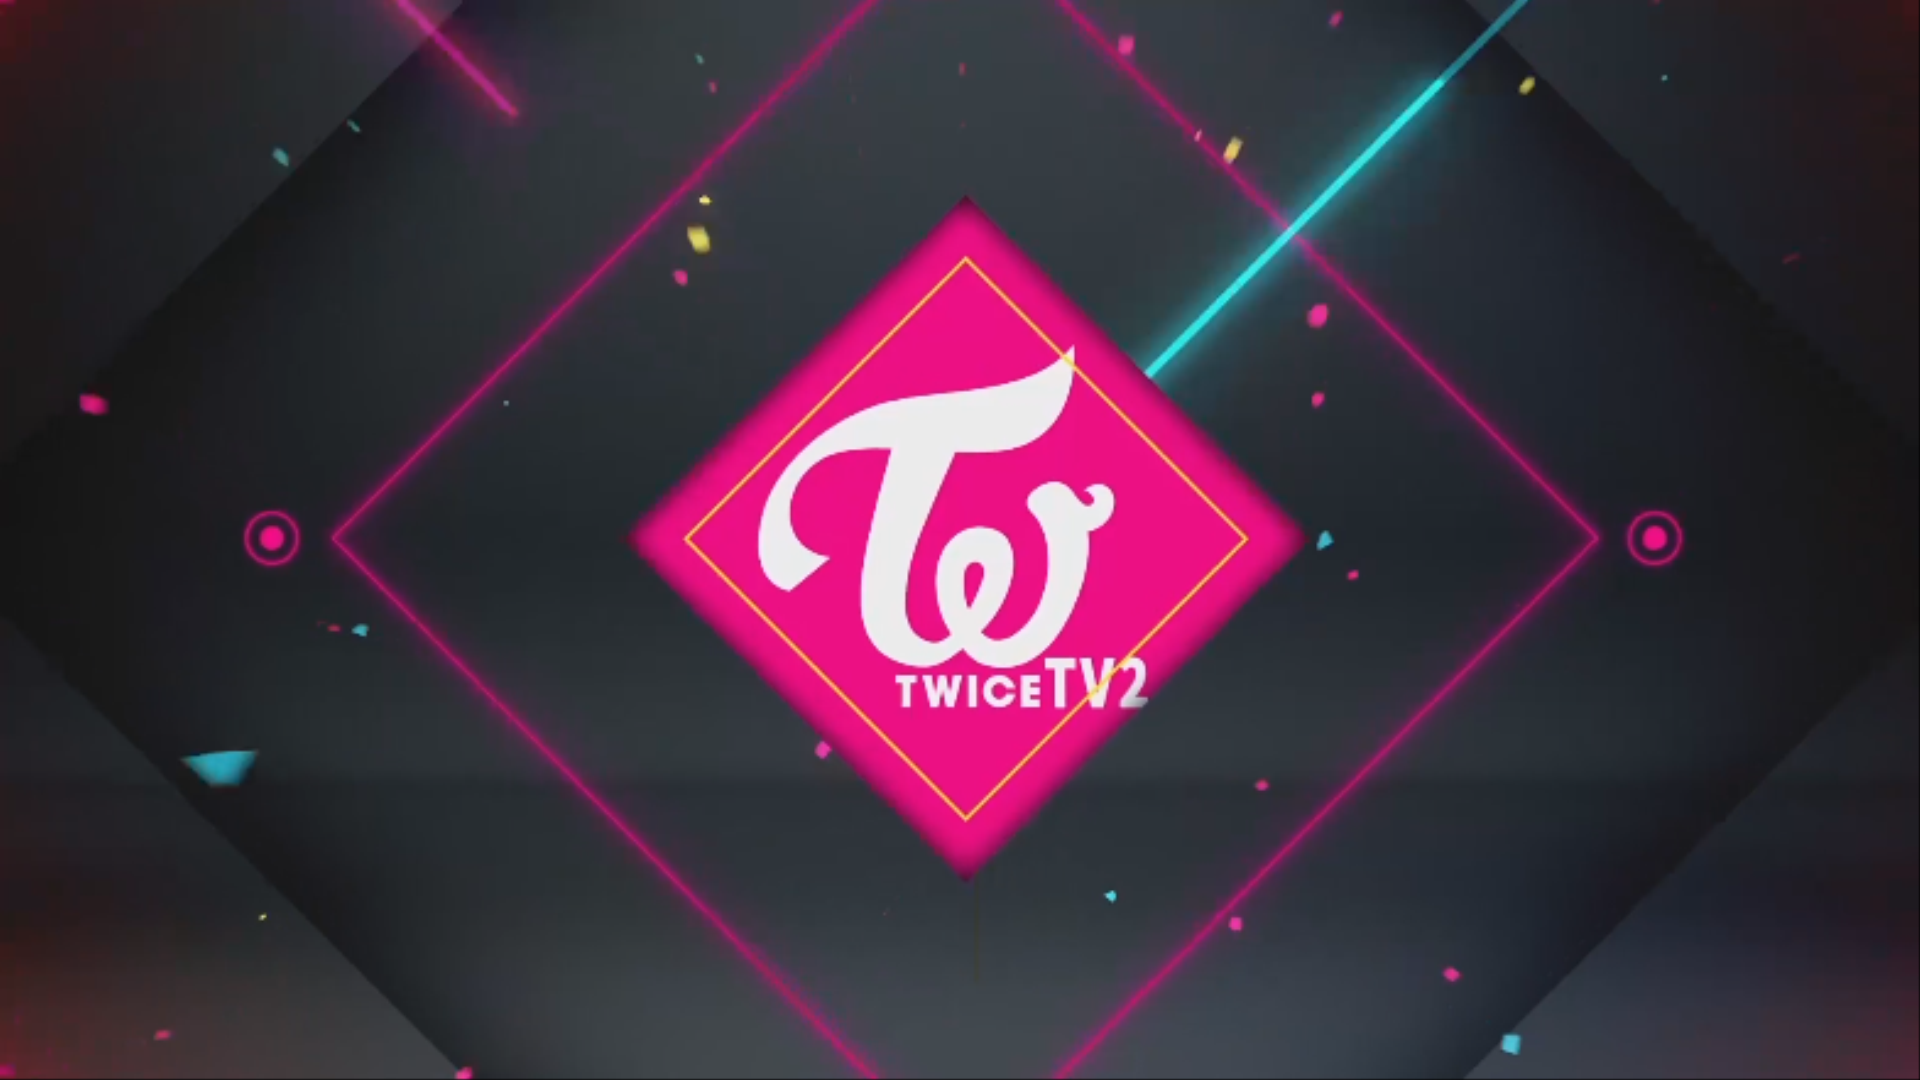 TWICE TV2 EP.01